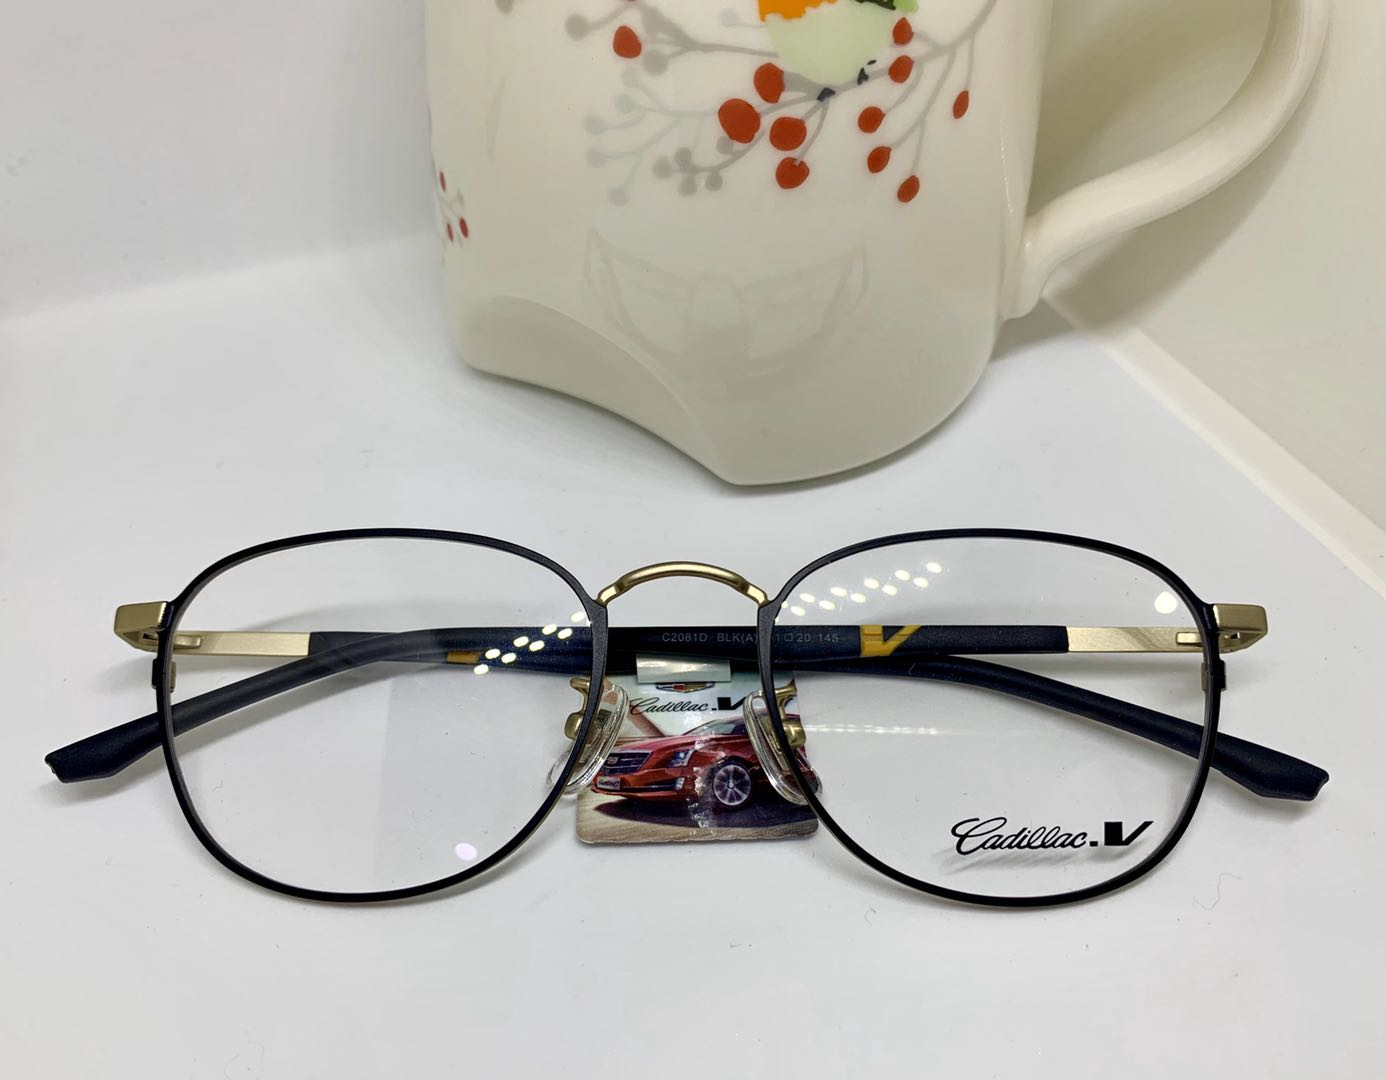 Cadillac凯迪拉克复古板材镜架男女文艺眼镜架全框气质舒适橡胶腿